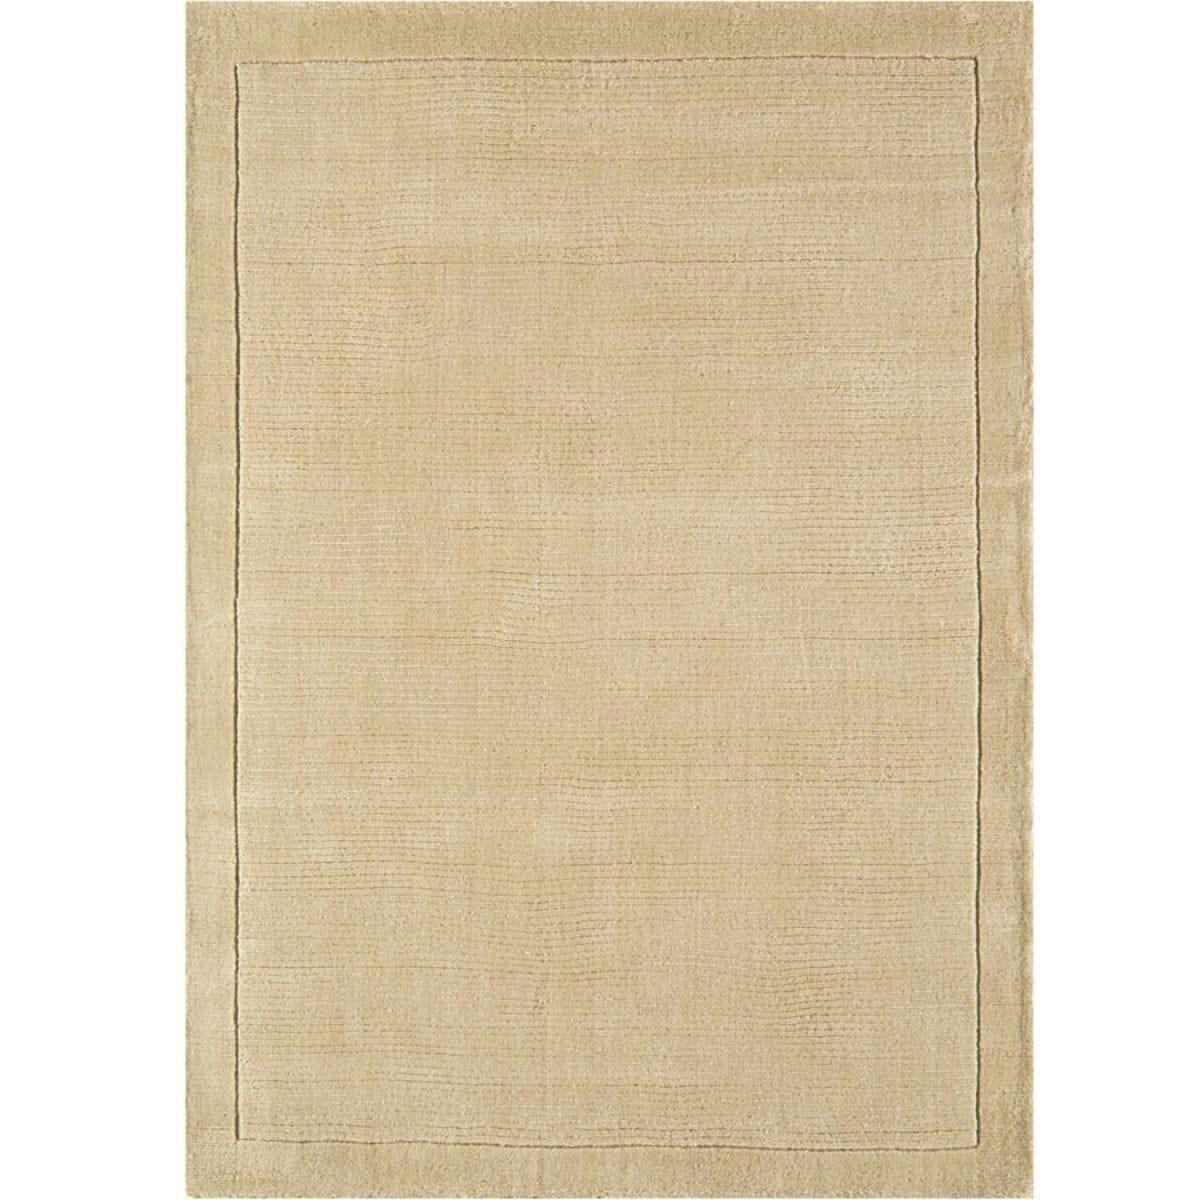 Asiatic York Rug, 120 x 170cm - Beige